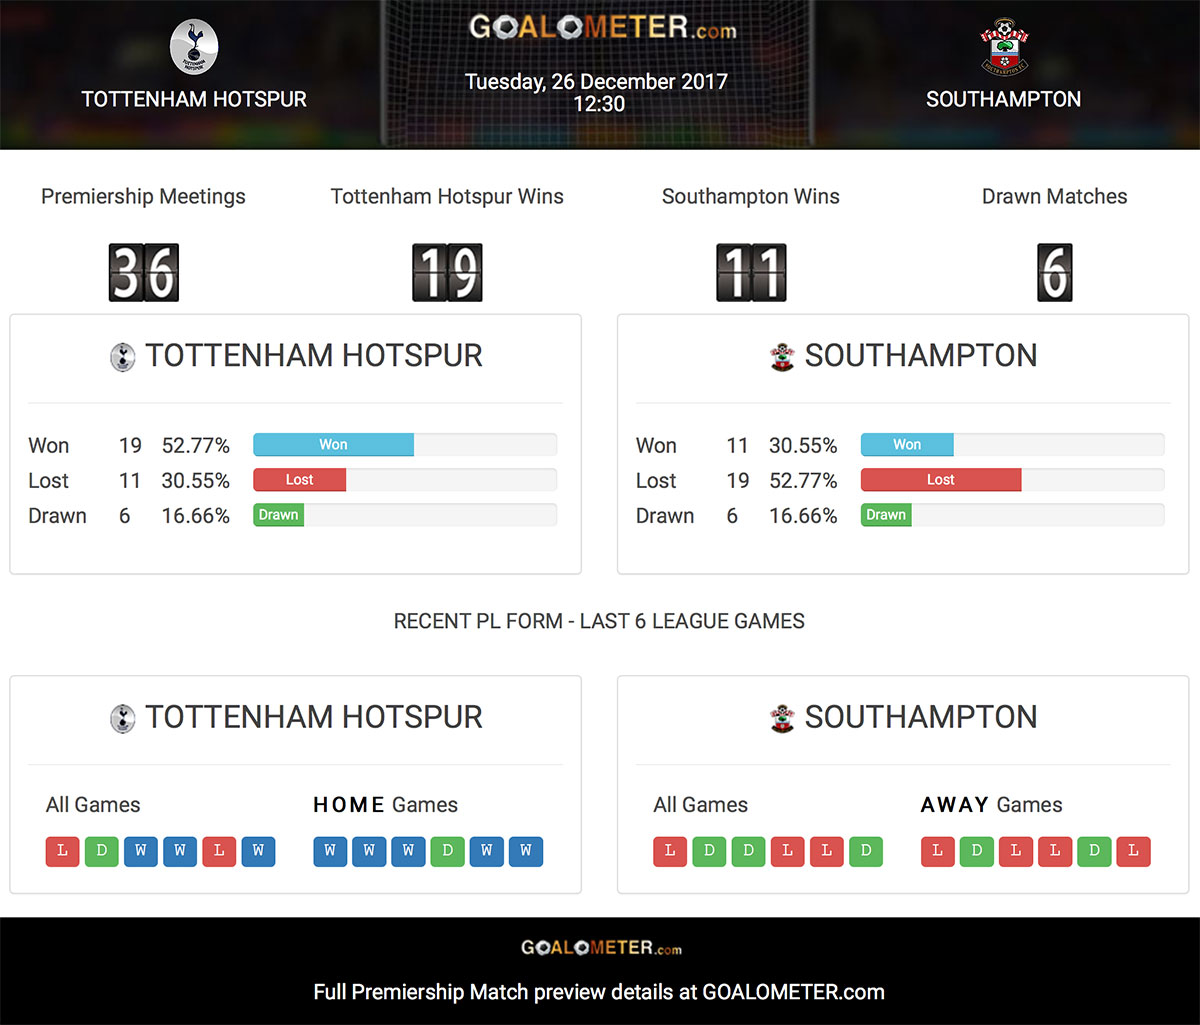 q_2017-12-26-Tottenham-Hotspur-vs-Southampton.jpg